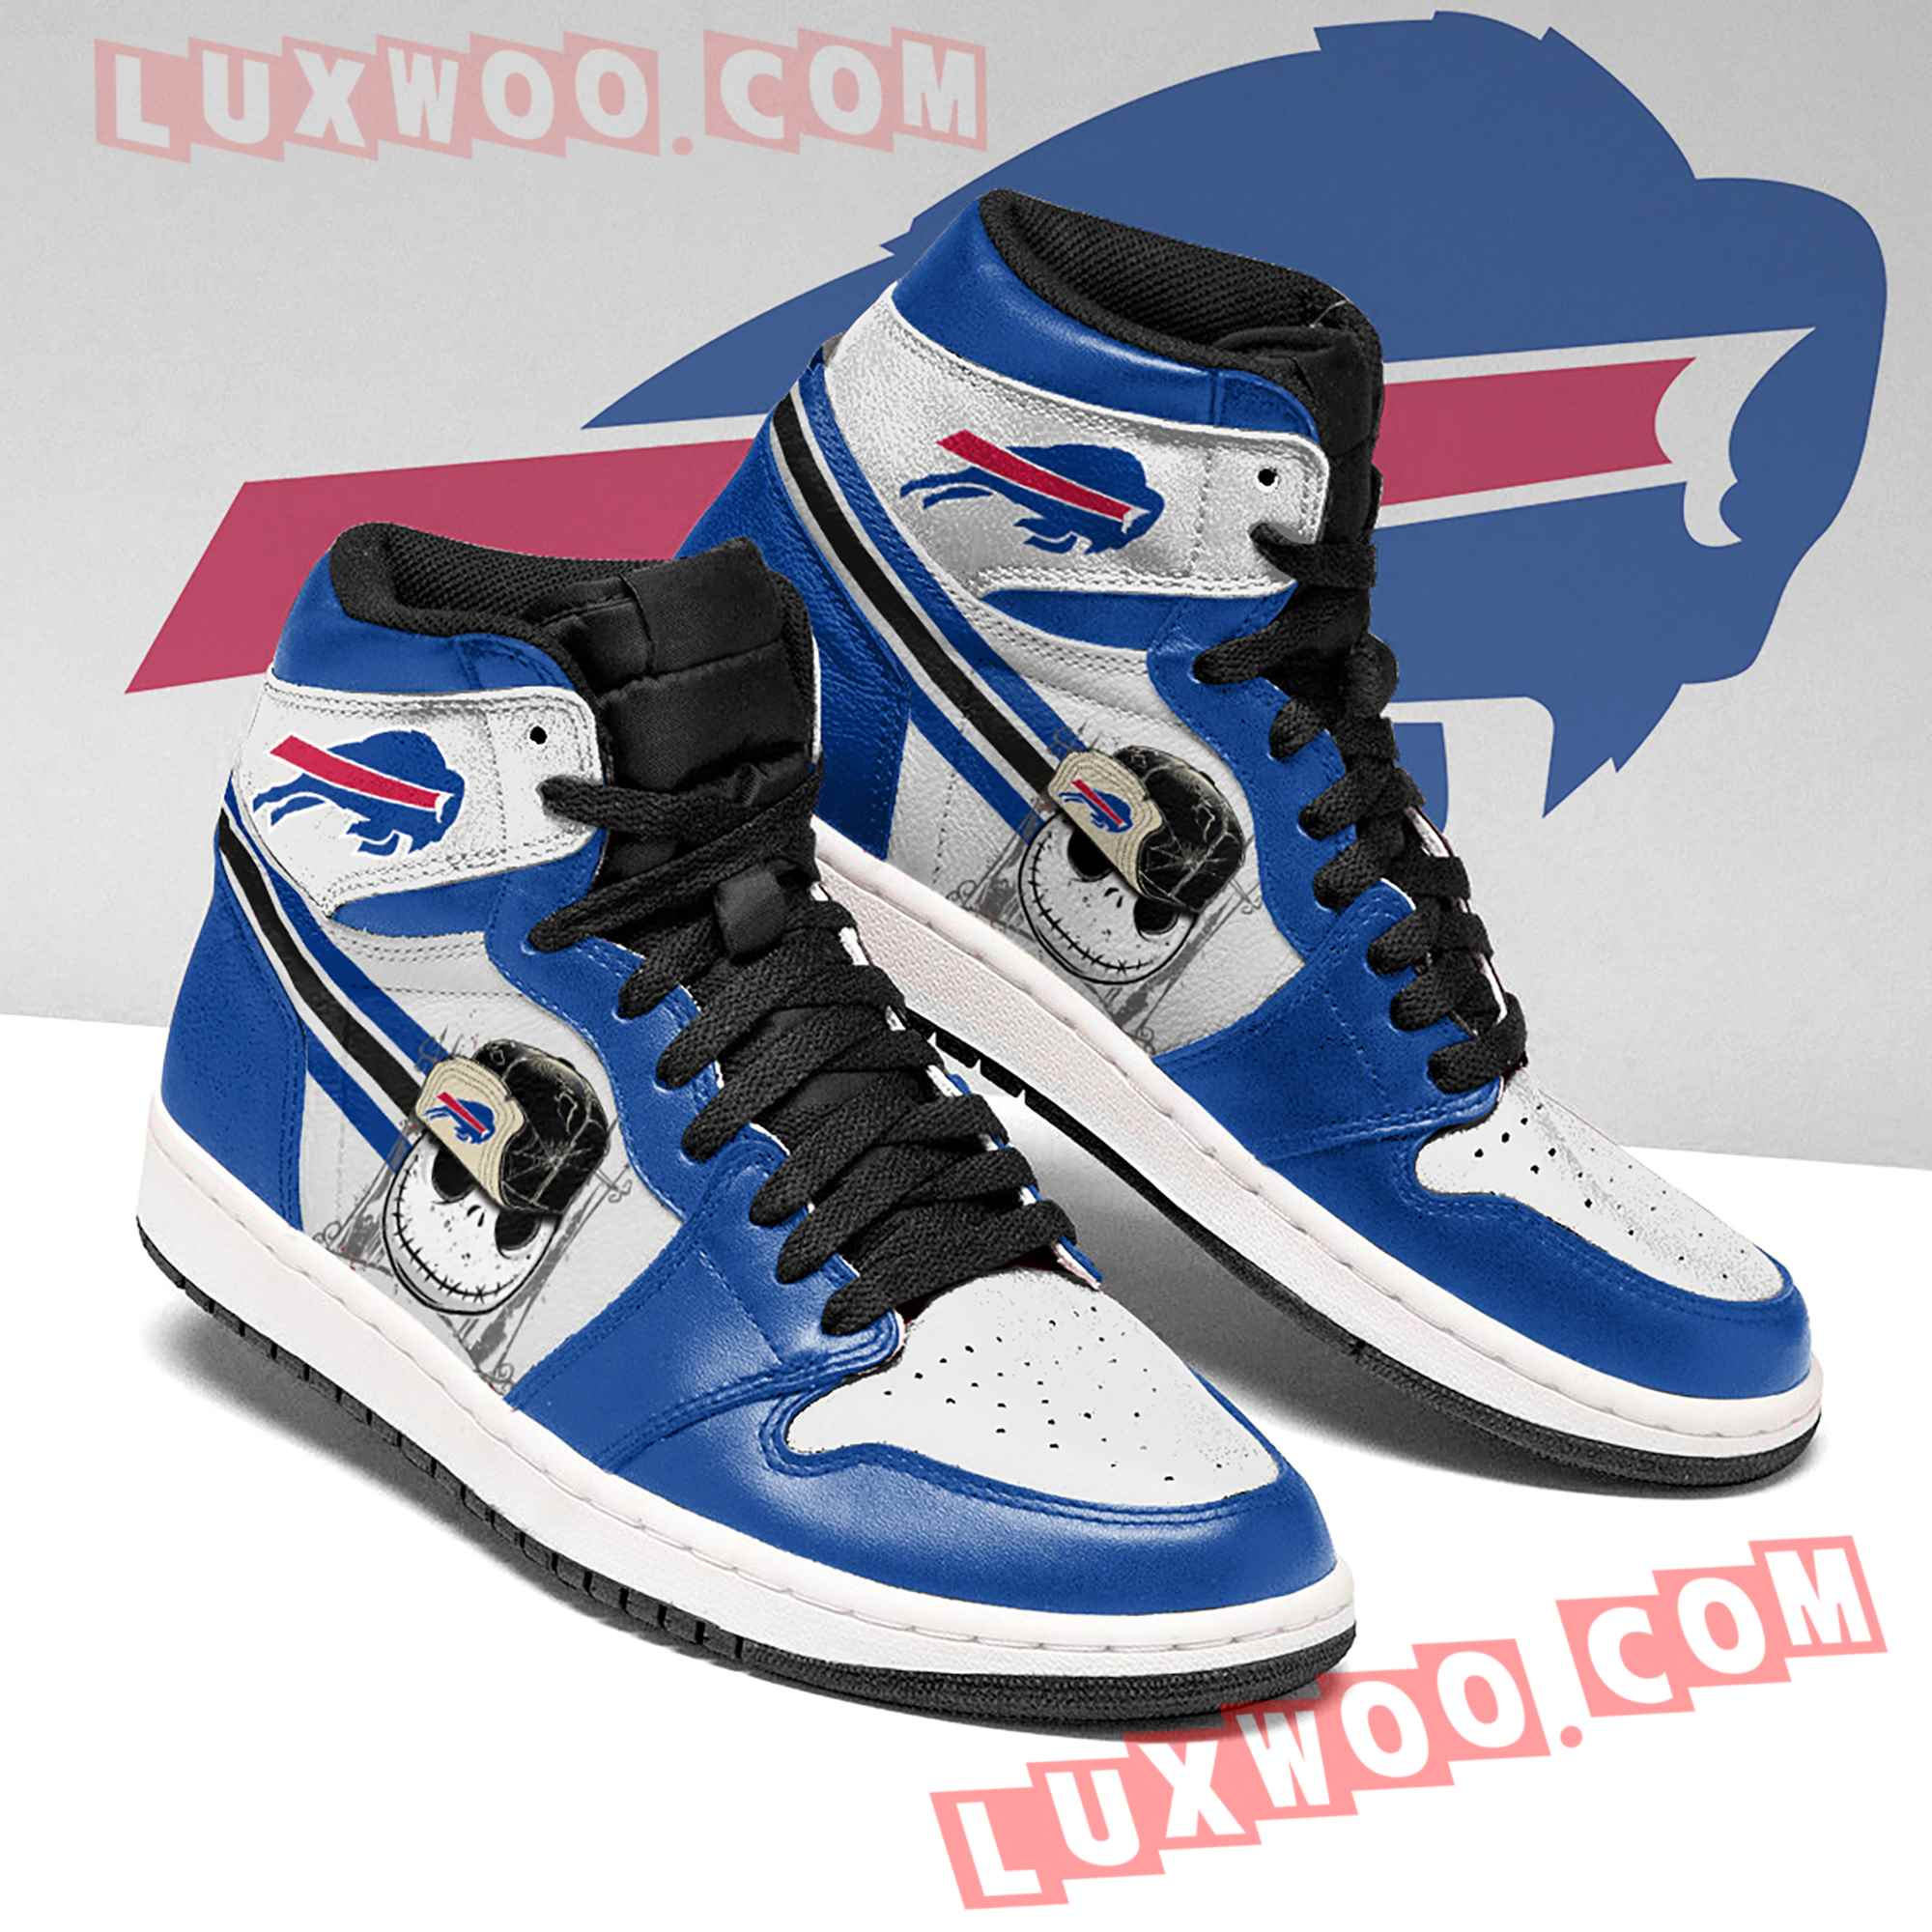 Buffalo Bills Nfl Air Jordan 1 Custom Shoes Sneaker V1